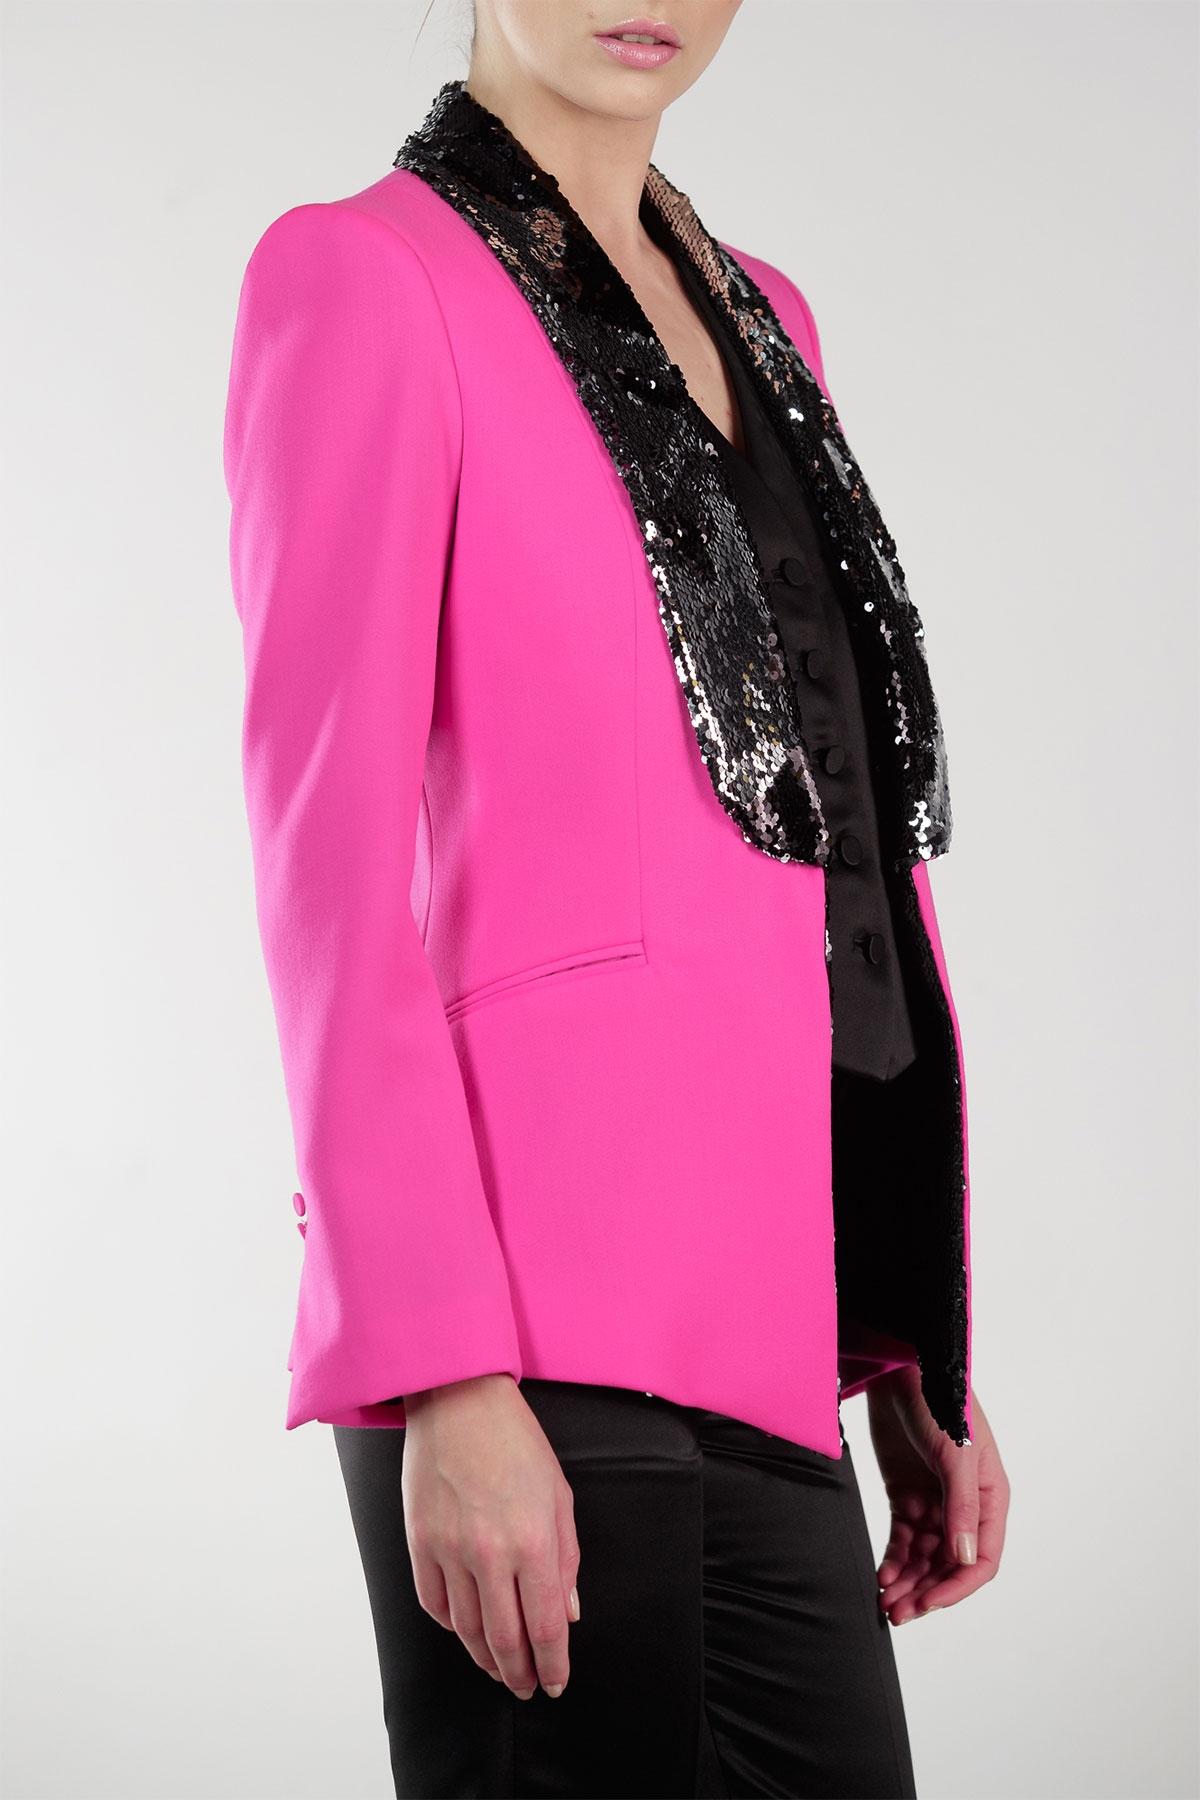 Hot Pink Tuxedo Sequin Embellished Lapel Styland